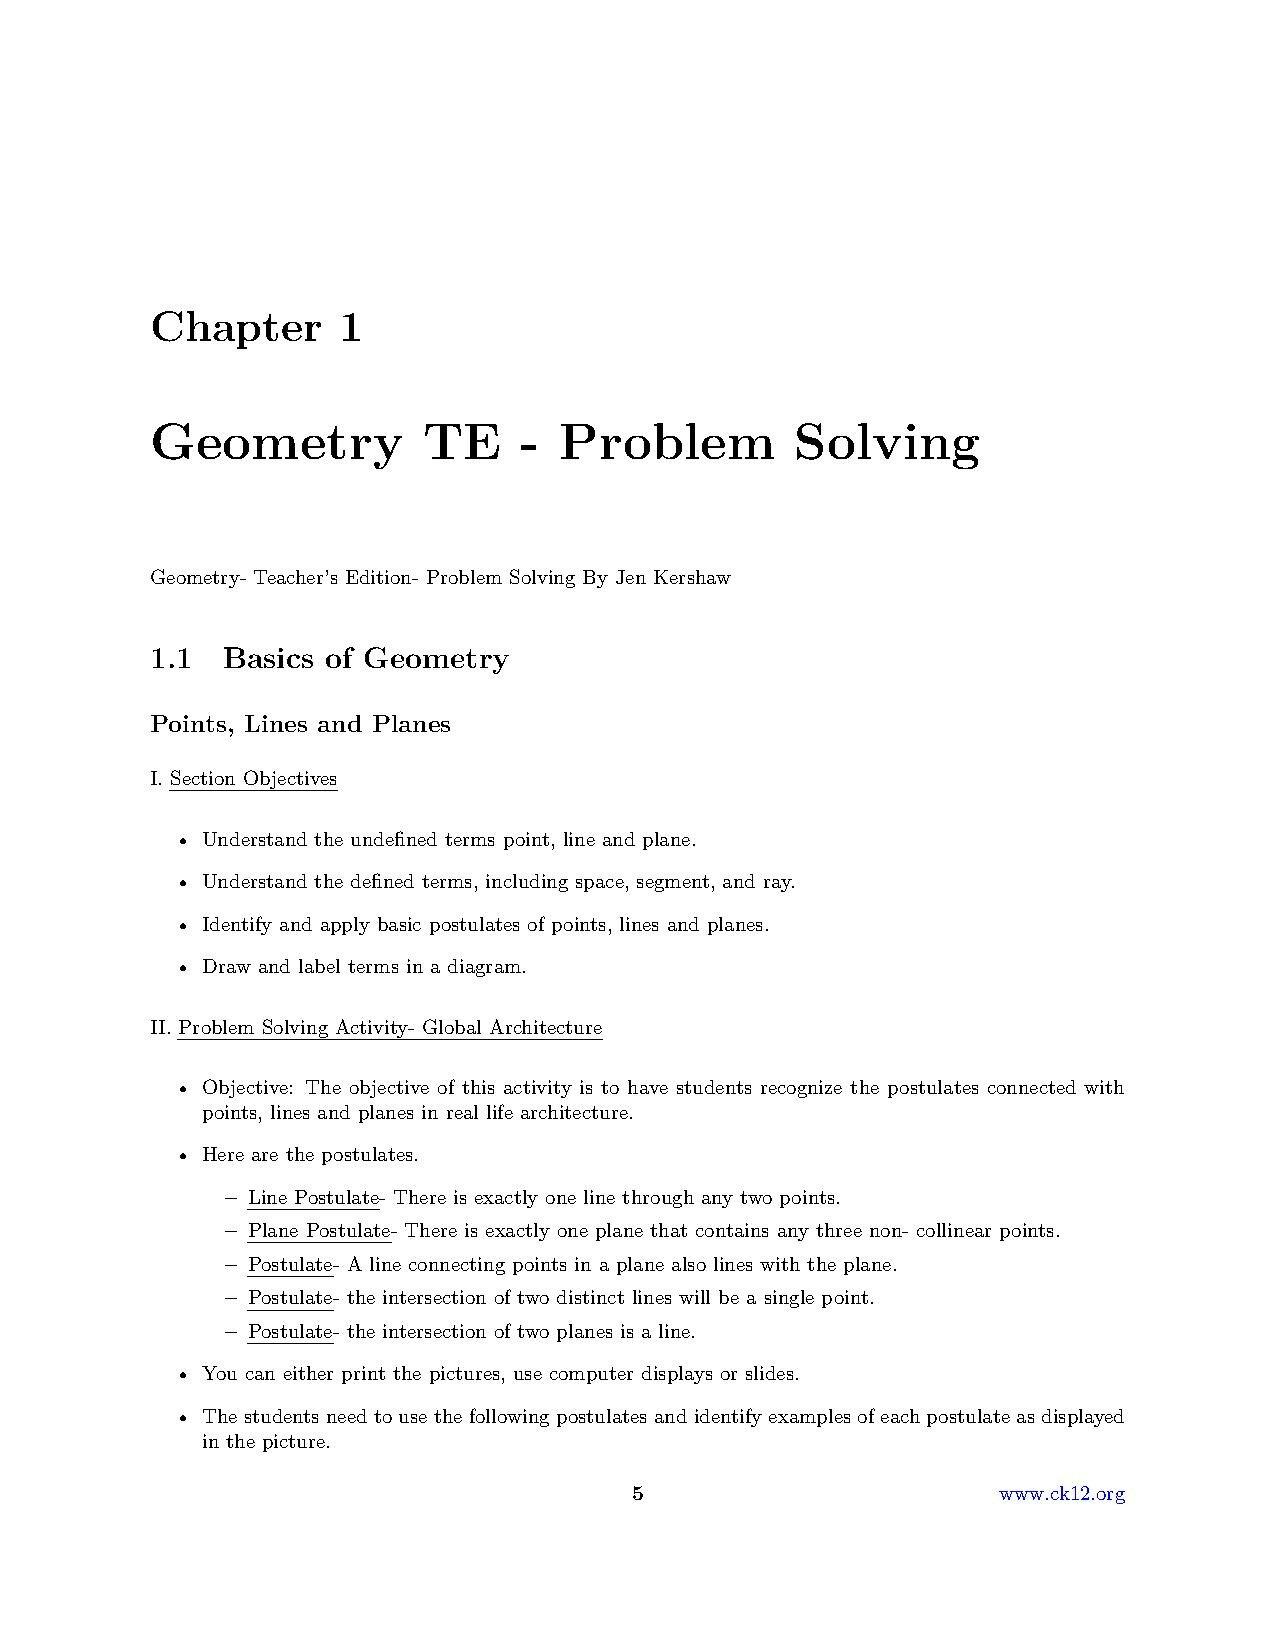 File:High School Geometry Problem Solving pdf - Wikipedia